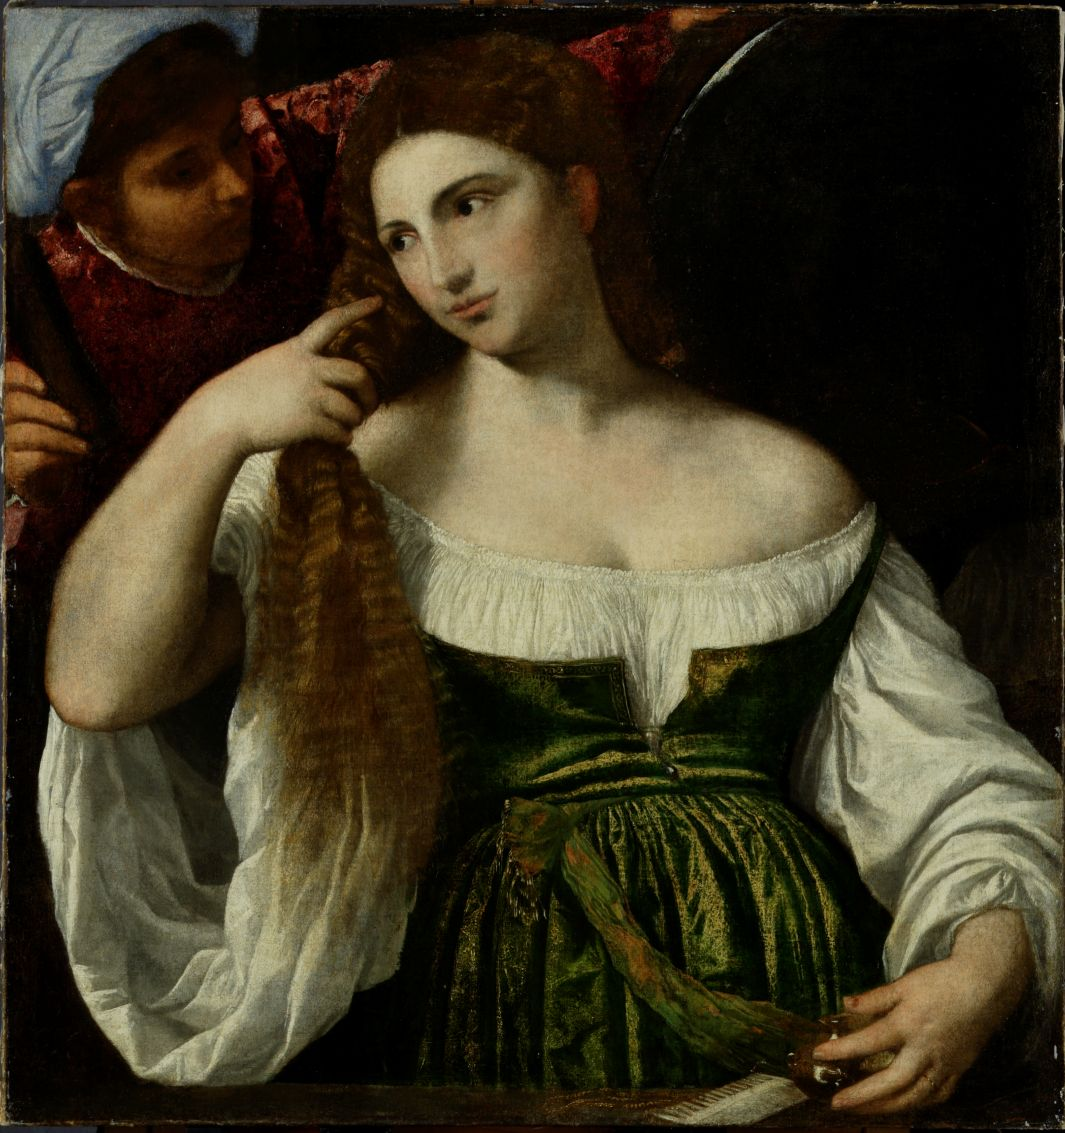 Тициан «Туалет молодой женщины» 1512-1515г.г.83 х 79 см Картинная галерея Пражского Града